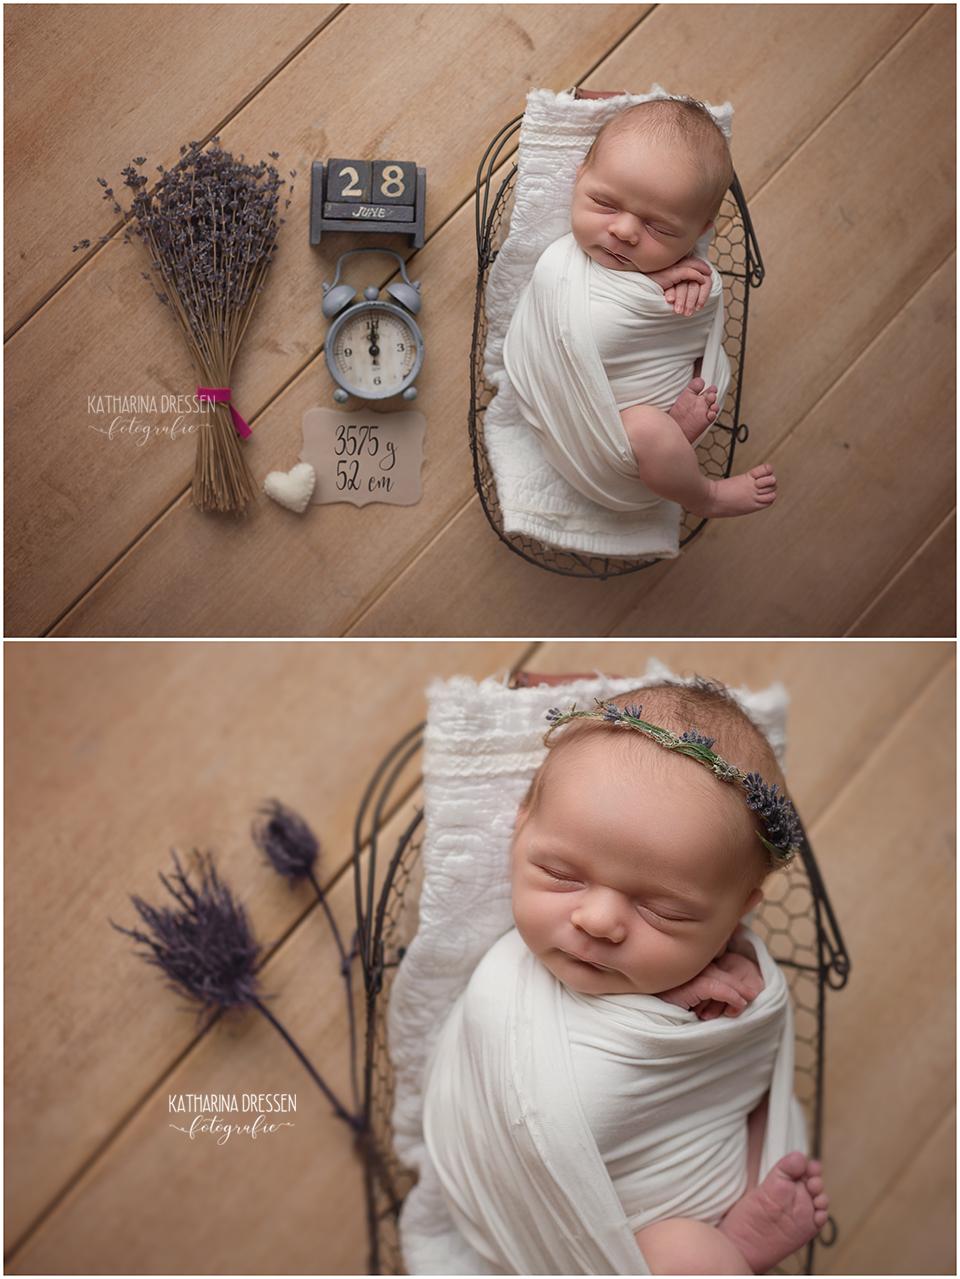 01_Babyfotograf_Baby-Fotoshooting_Neugeboren_Geburt_Schwangerschaft_Hebamme_Schwanger_Fotograf_Duesseldorf_Koeln_Moenchengladbach